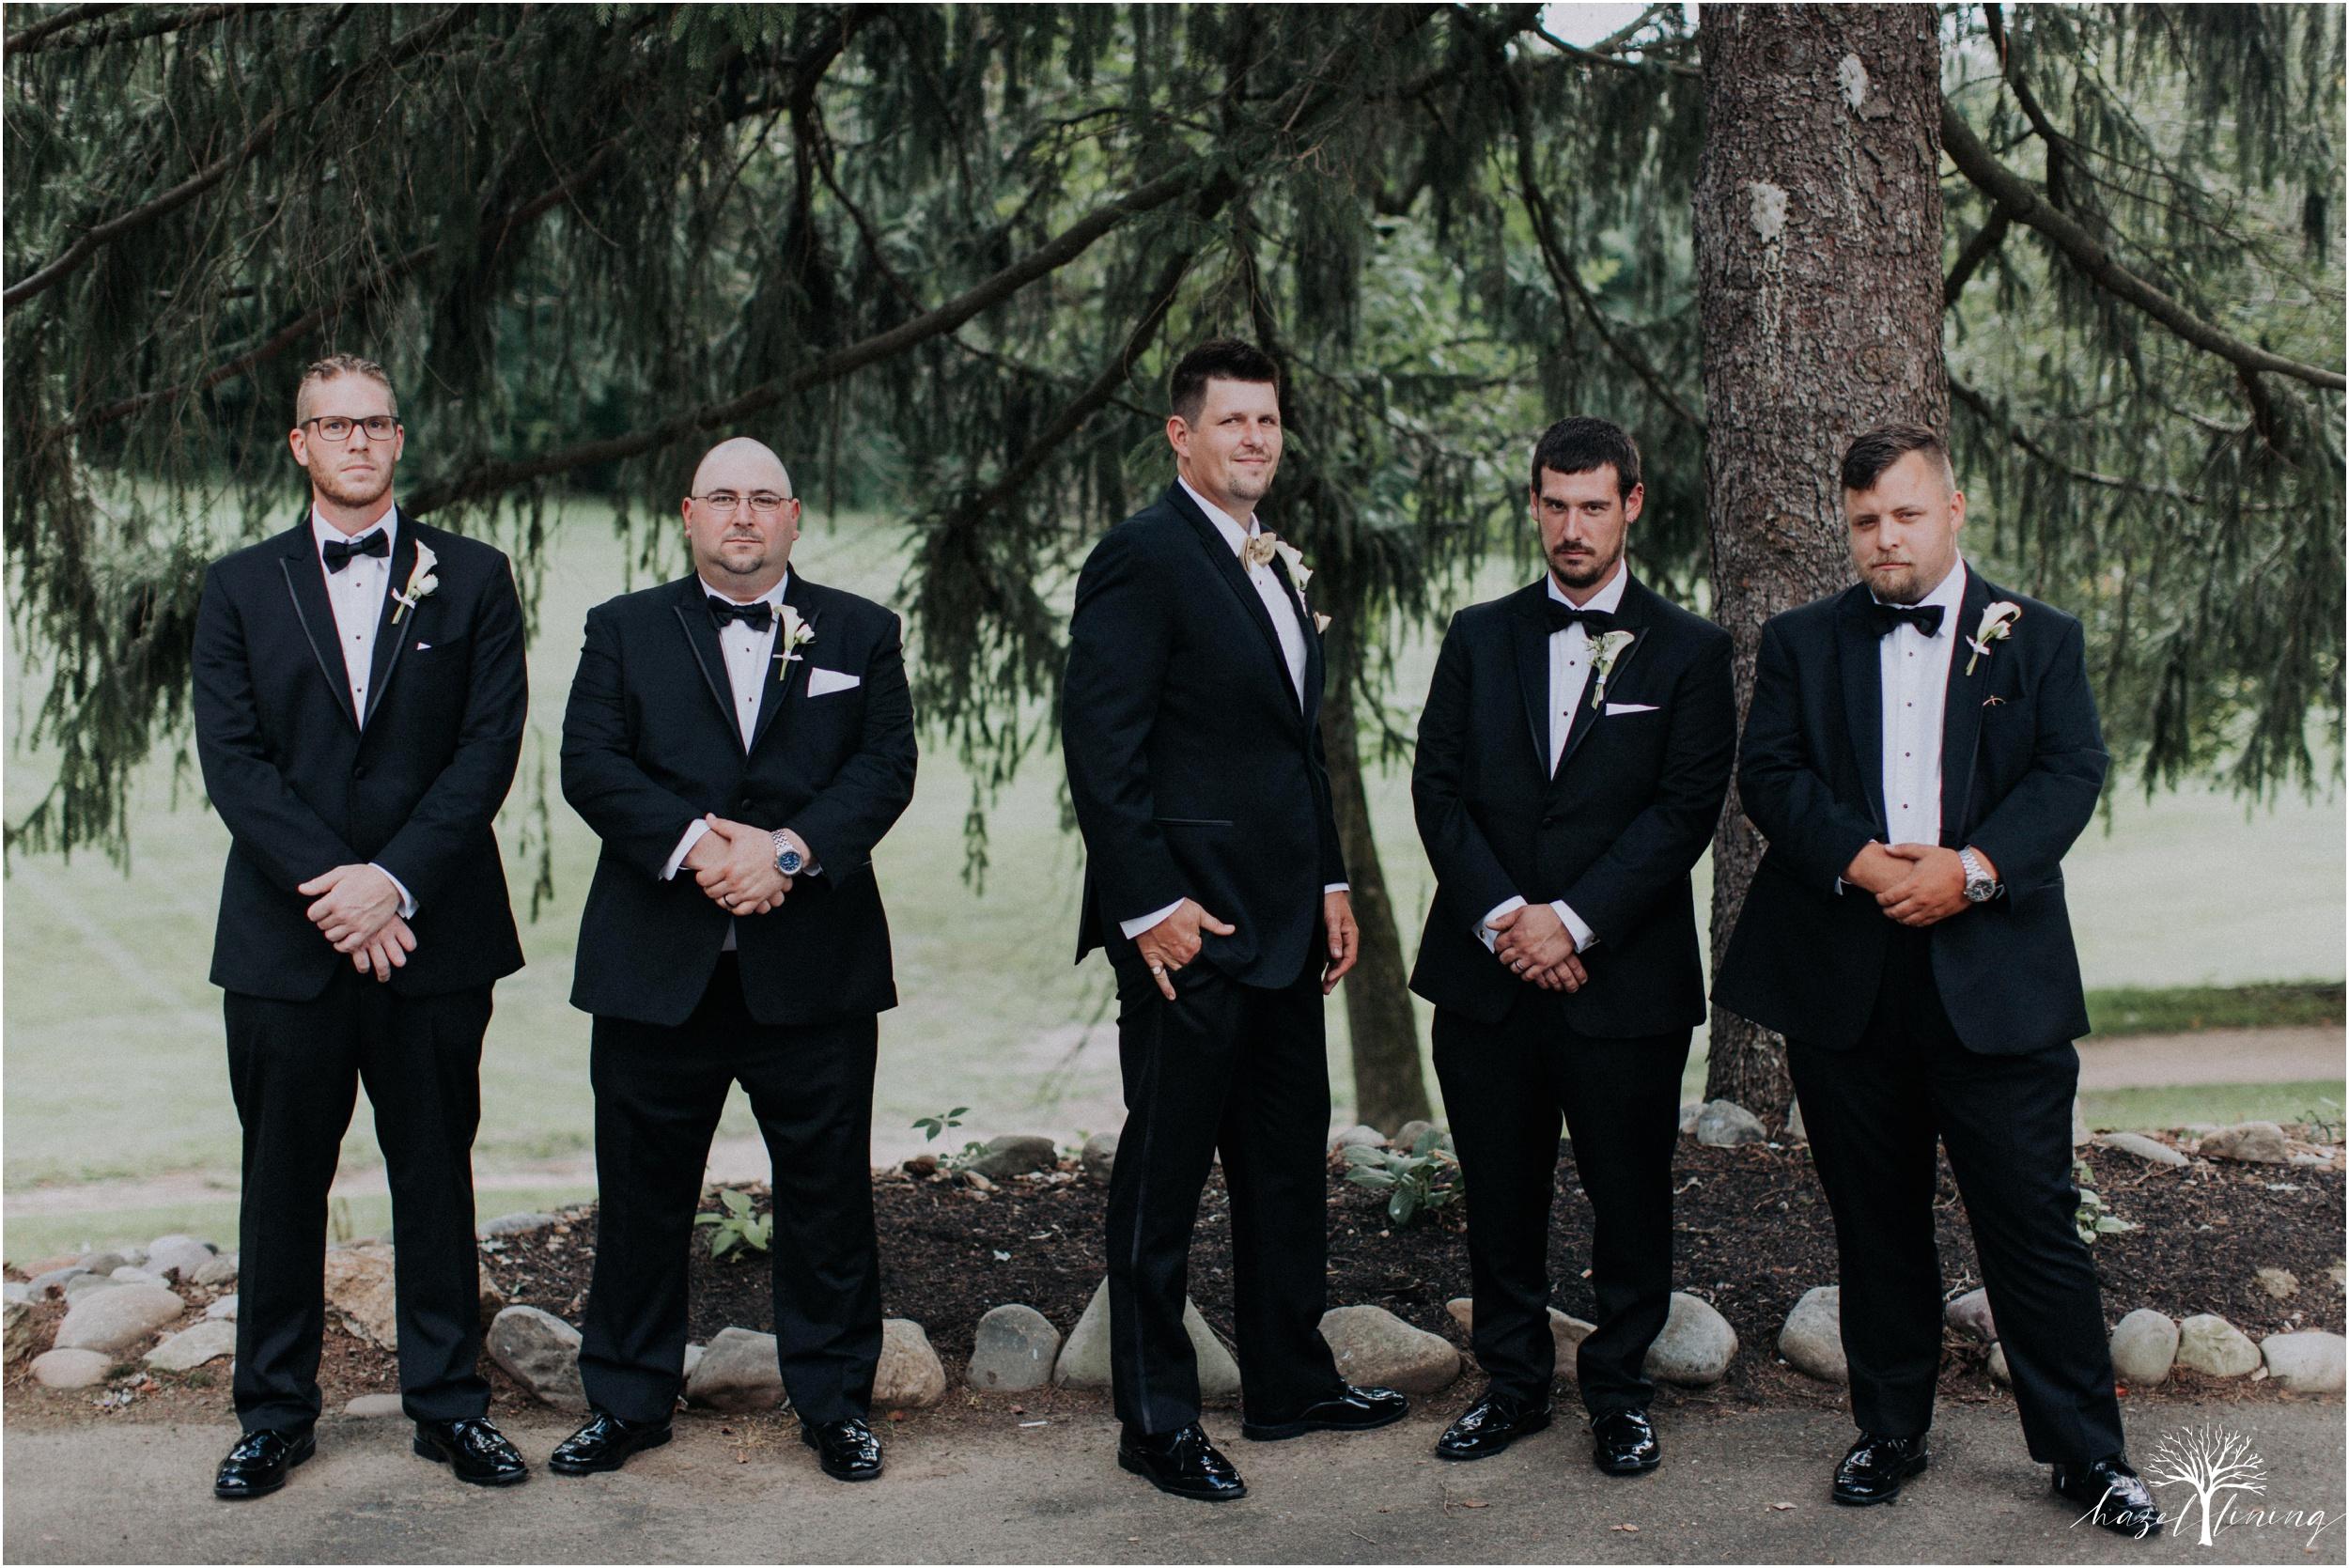 elizabeth-doelp-andrew-foreback-middletown-country-club-summer-langhorne-pennsylvania-wedding-hazel-lining-travel-wedding-elopement-photography_0067.jpg